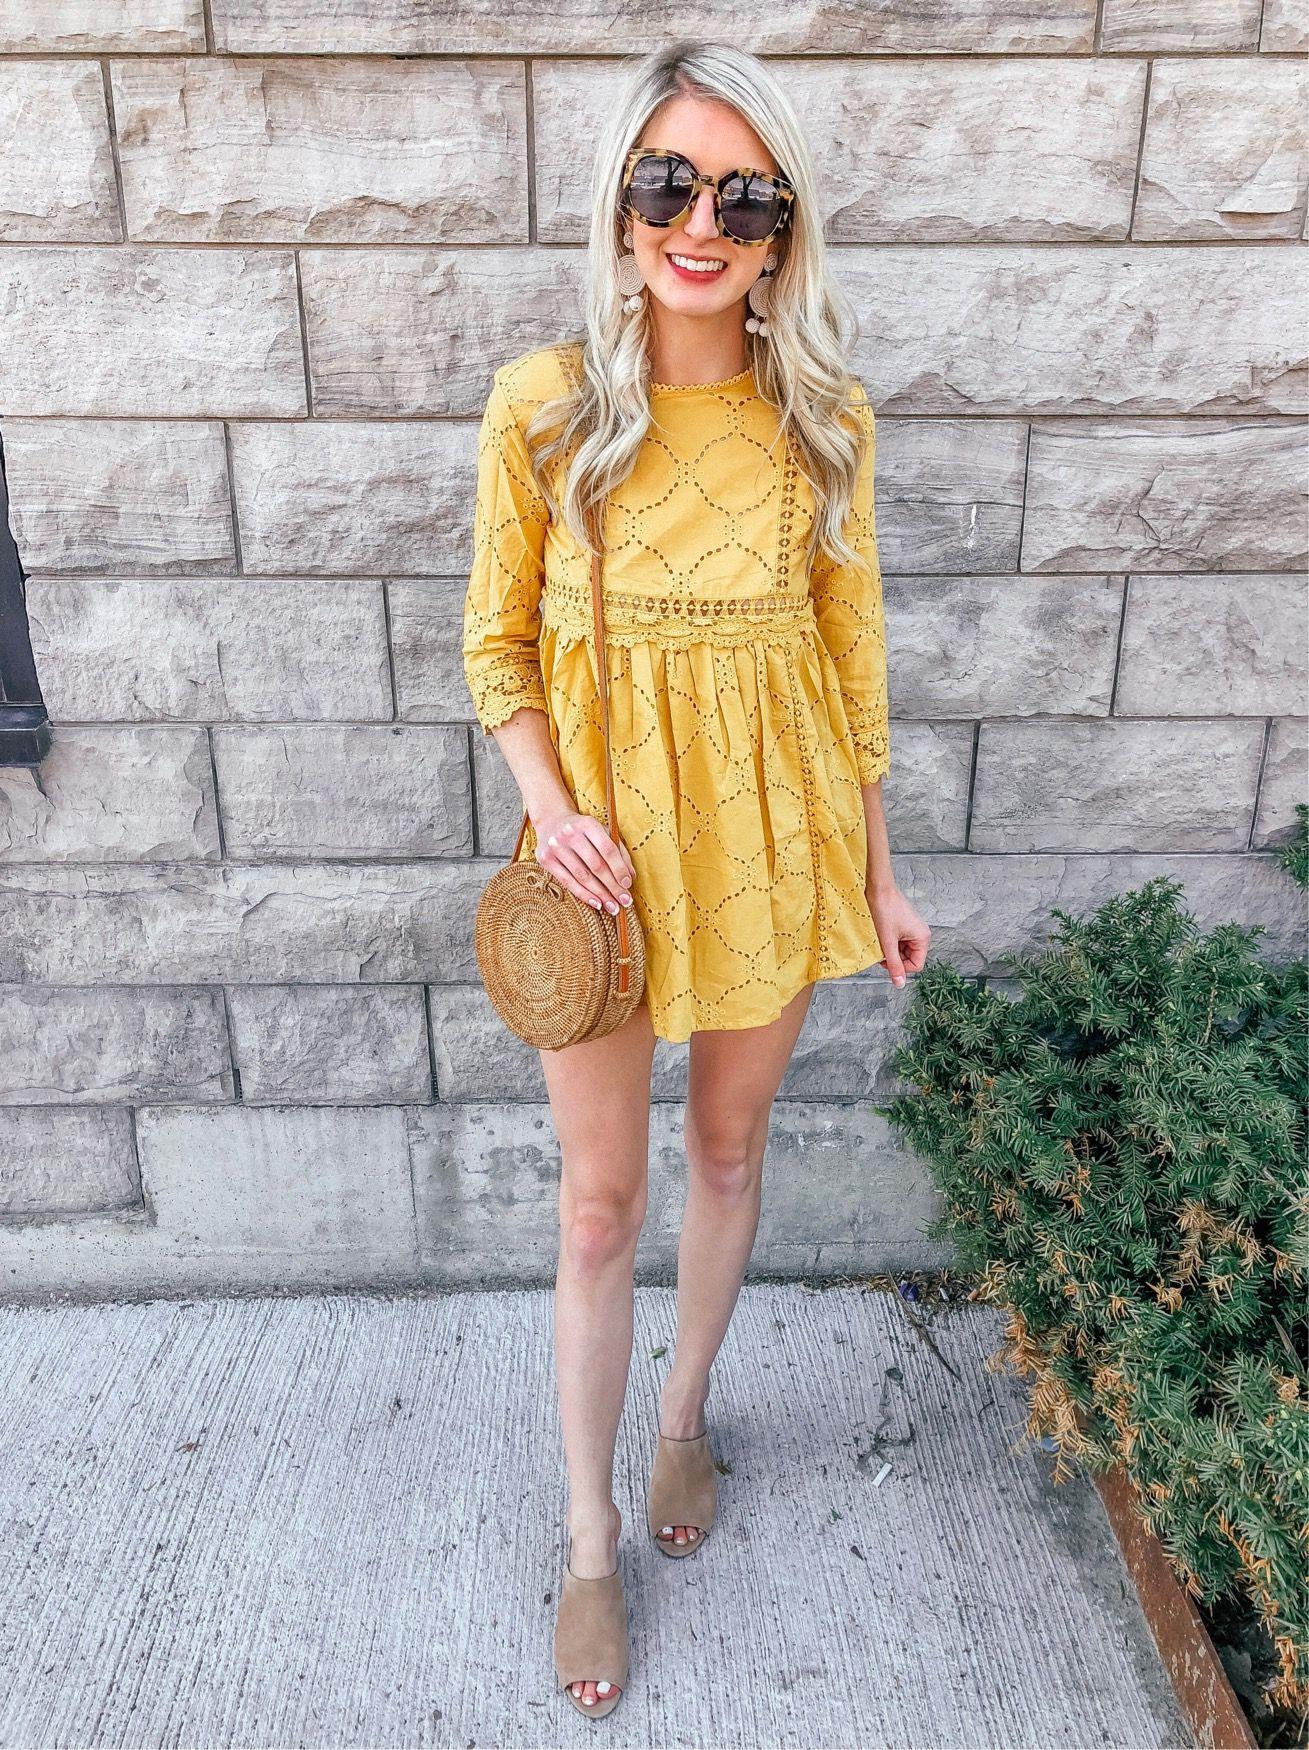 Yellow dress for women  Prada u Pearls  Instagram roundup  babydoll  babydoll dress